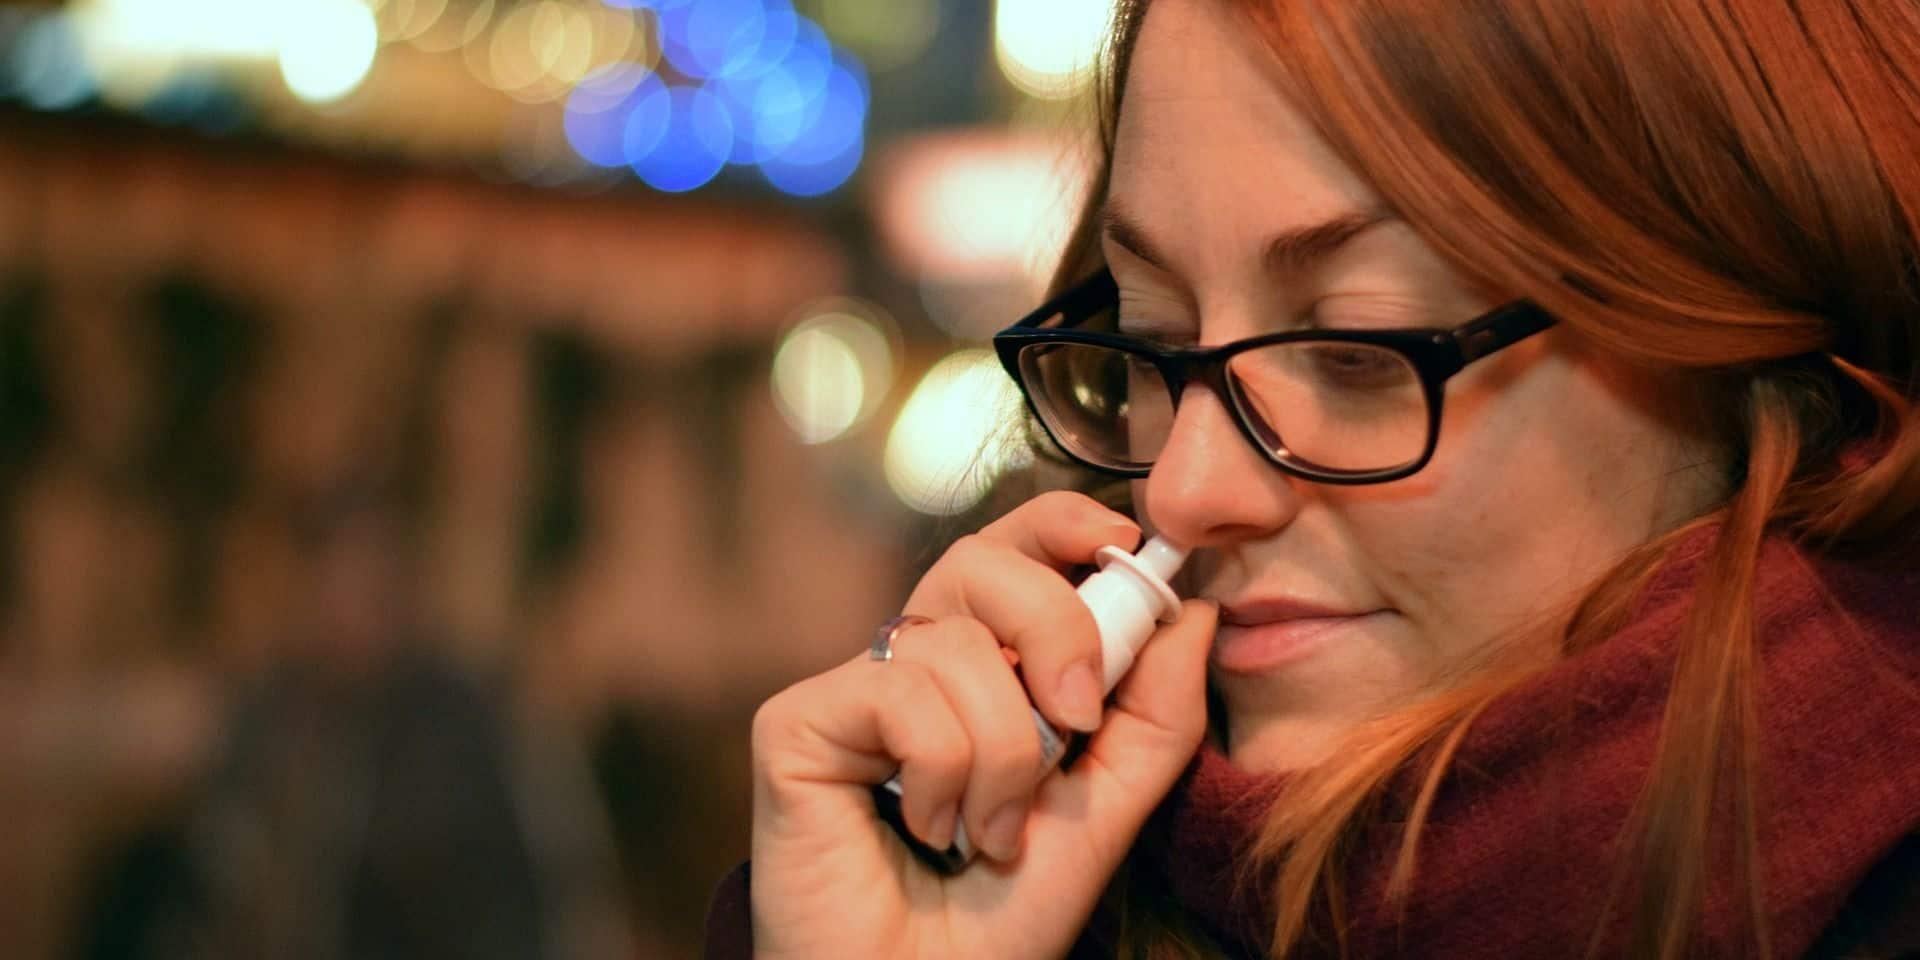 Le spray nasal, la solution contre le coronavirus ?